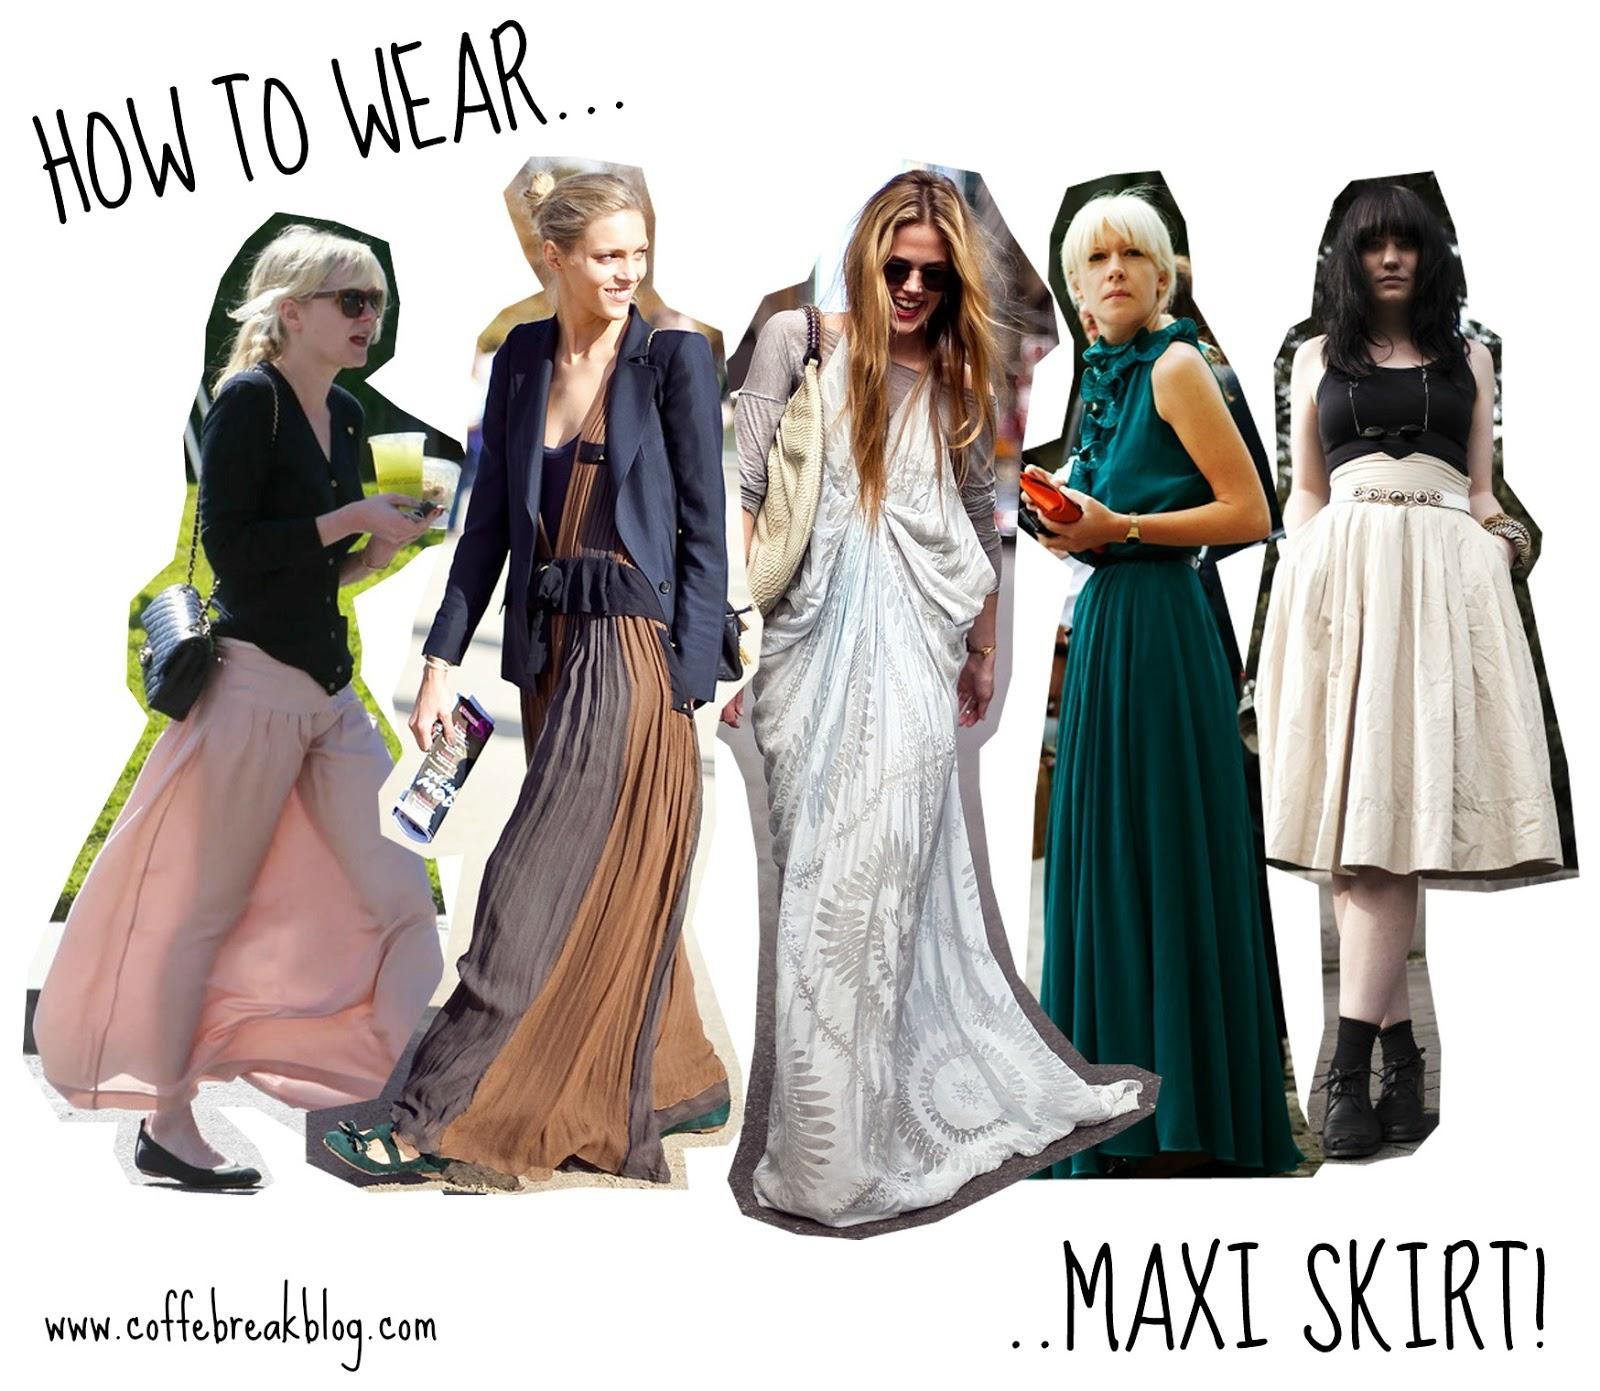 coffe break lifestyle blog how to wear maxi skirt